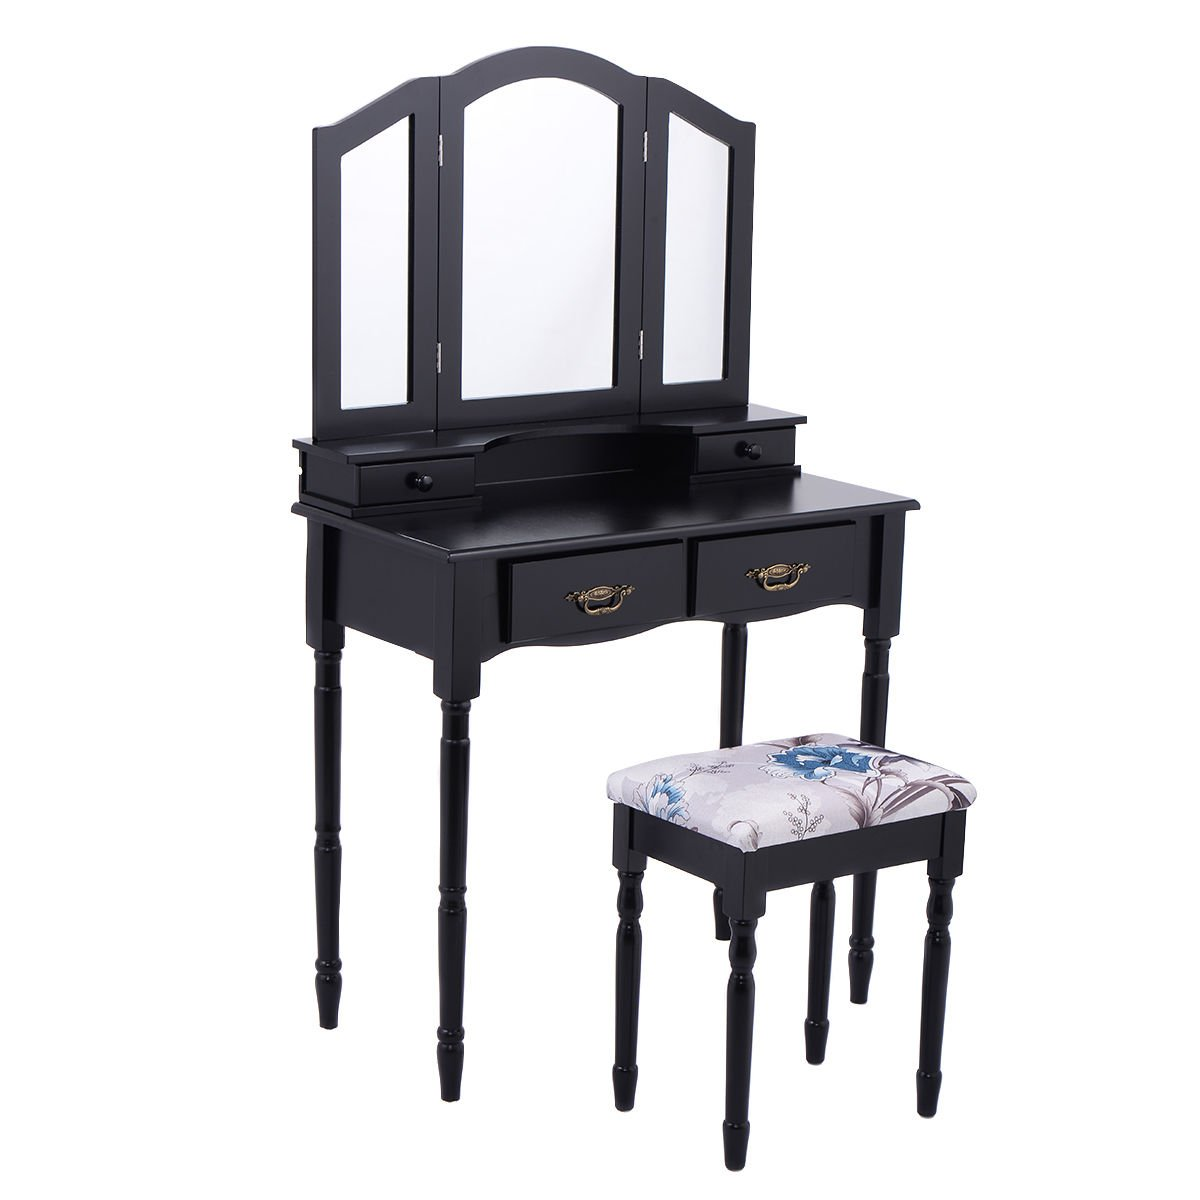 Giantex Tri Folding Mirror Vanity Makeup Table Stool Set Home Furni W/4 Drawers (Black)